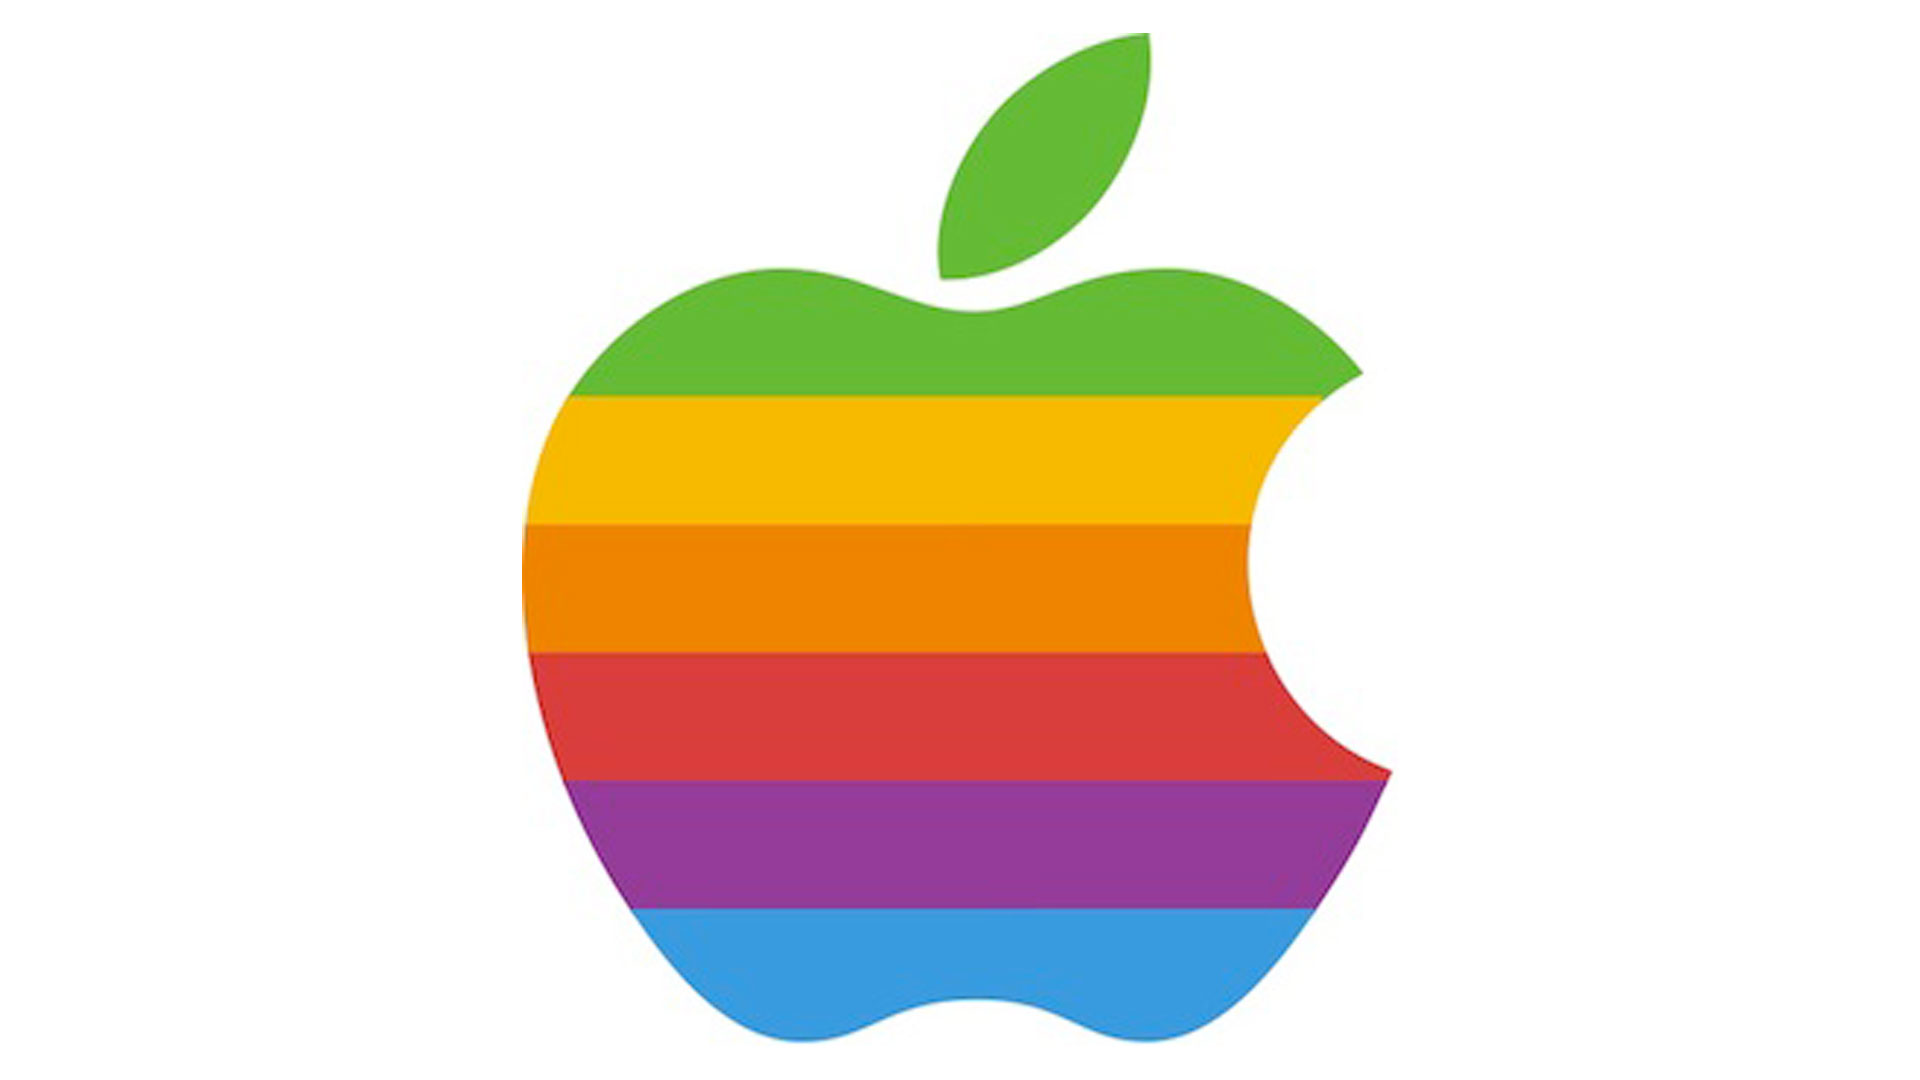 Rob Janoff diseñó el famoso logo de la manzana mordida